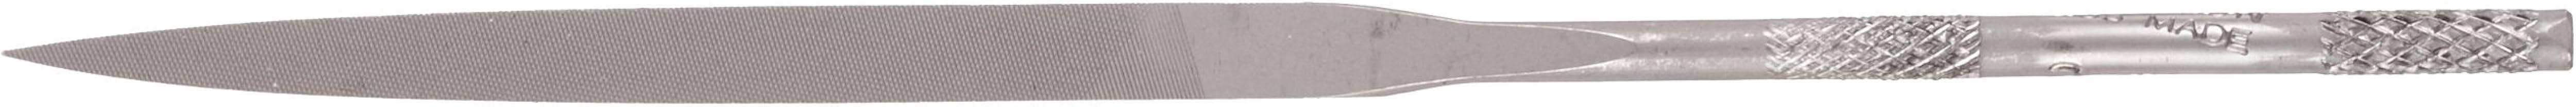 "Nicholson Needle File with Handle, Swiss Pattern, Double Cut, Knife, #2 Coarseness, 4"" Length"